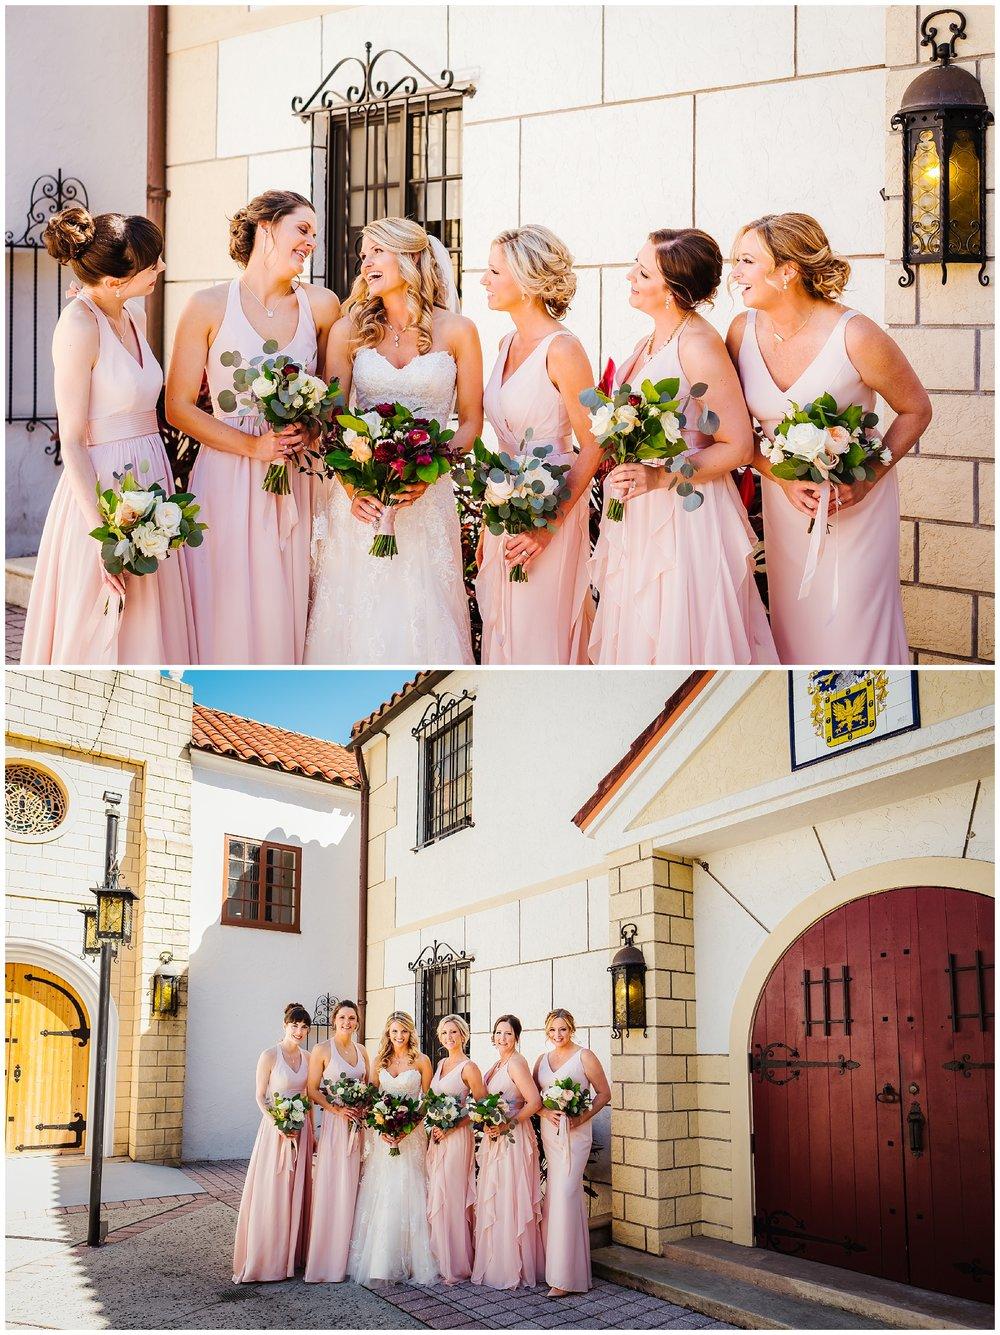 tampa-bradenton-wedding-photographer-south-florida-museum-classic-blush-gold-alpacas-sparklers_0032.jpg